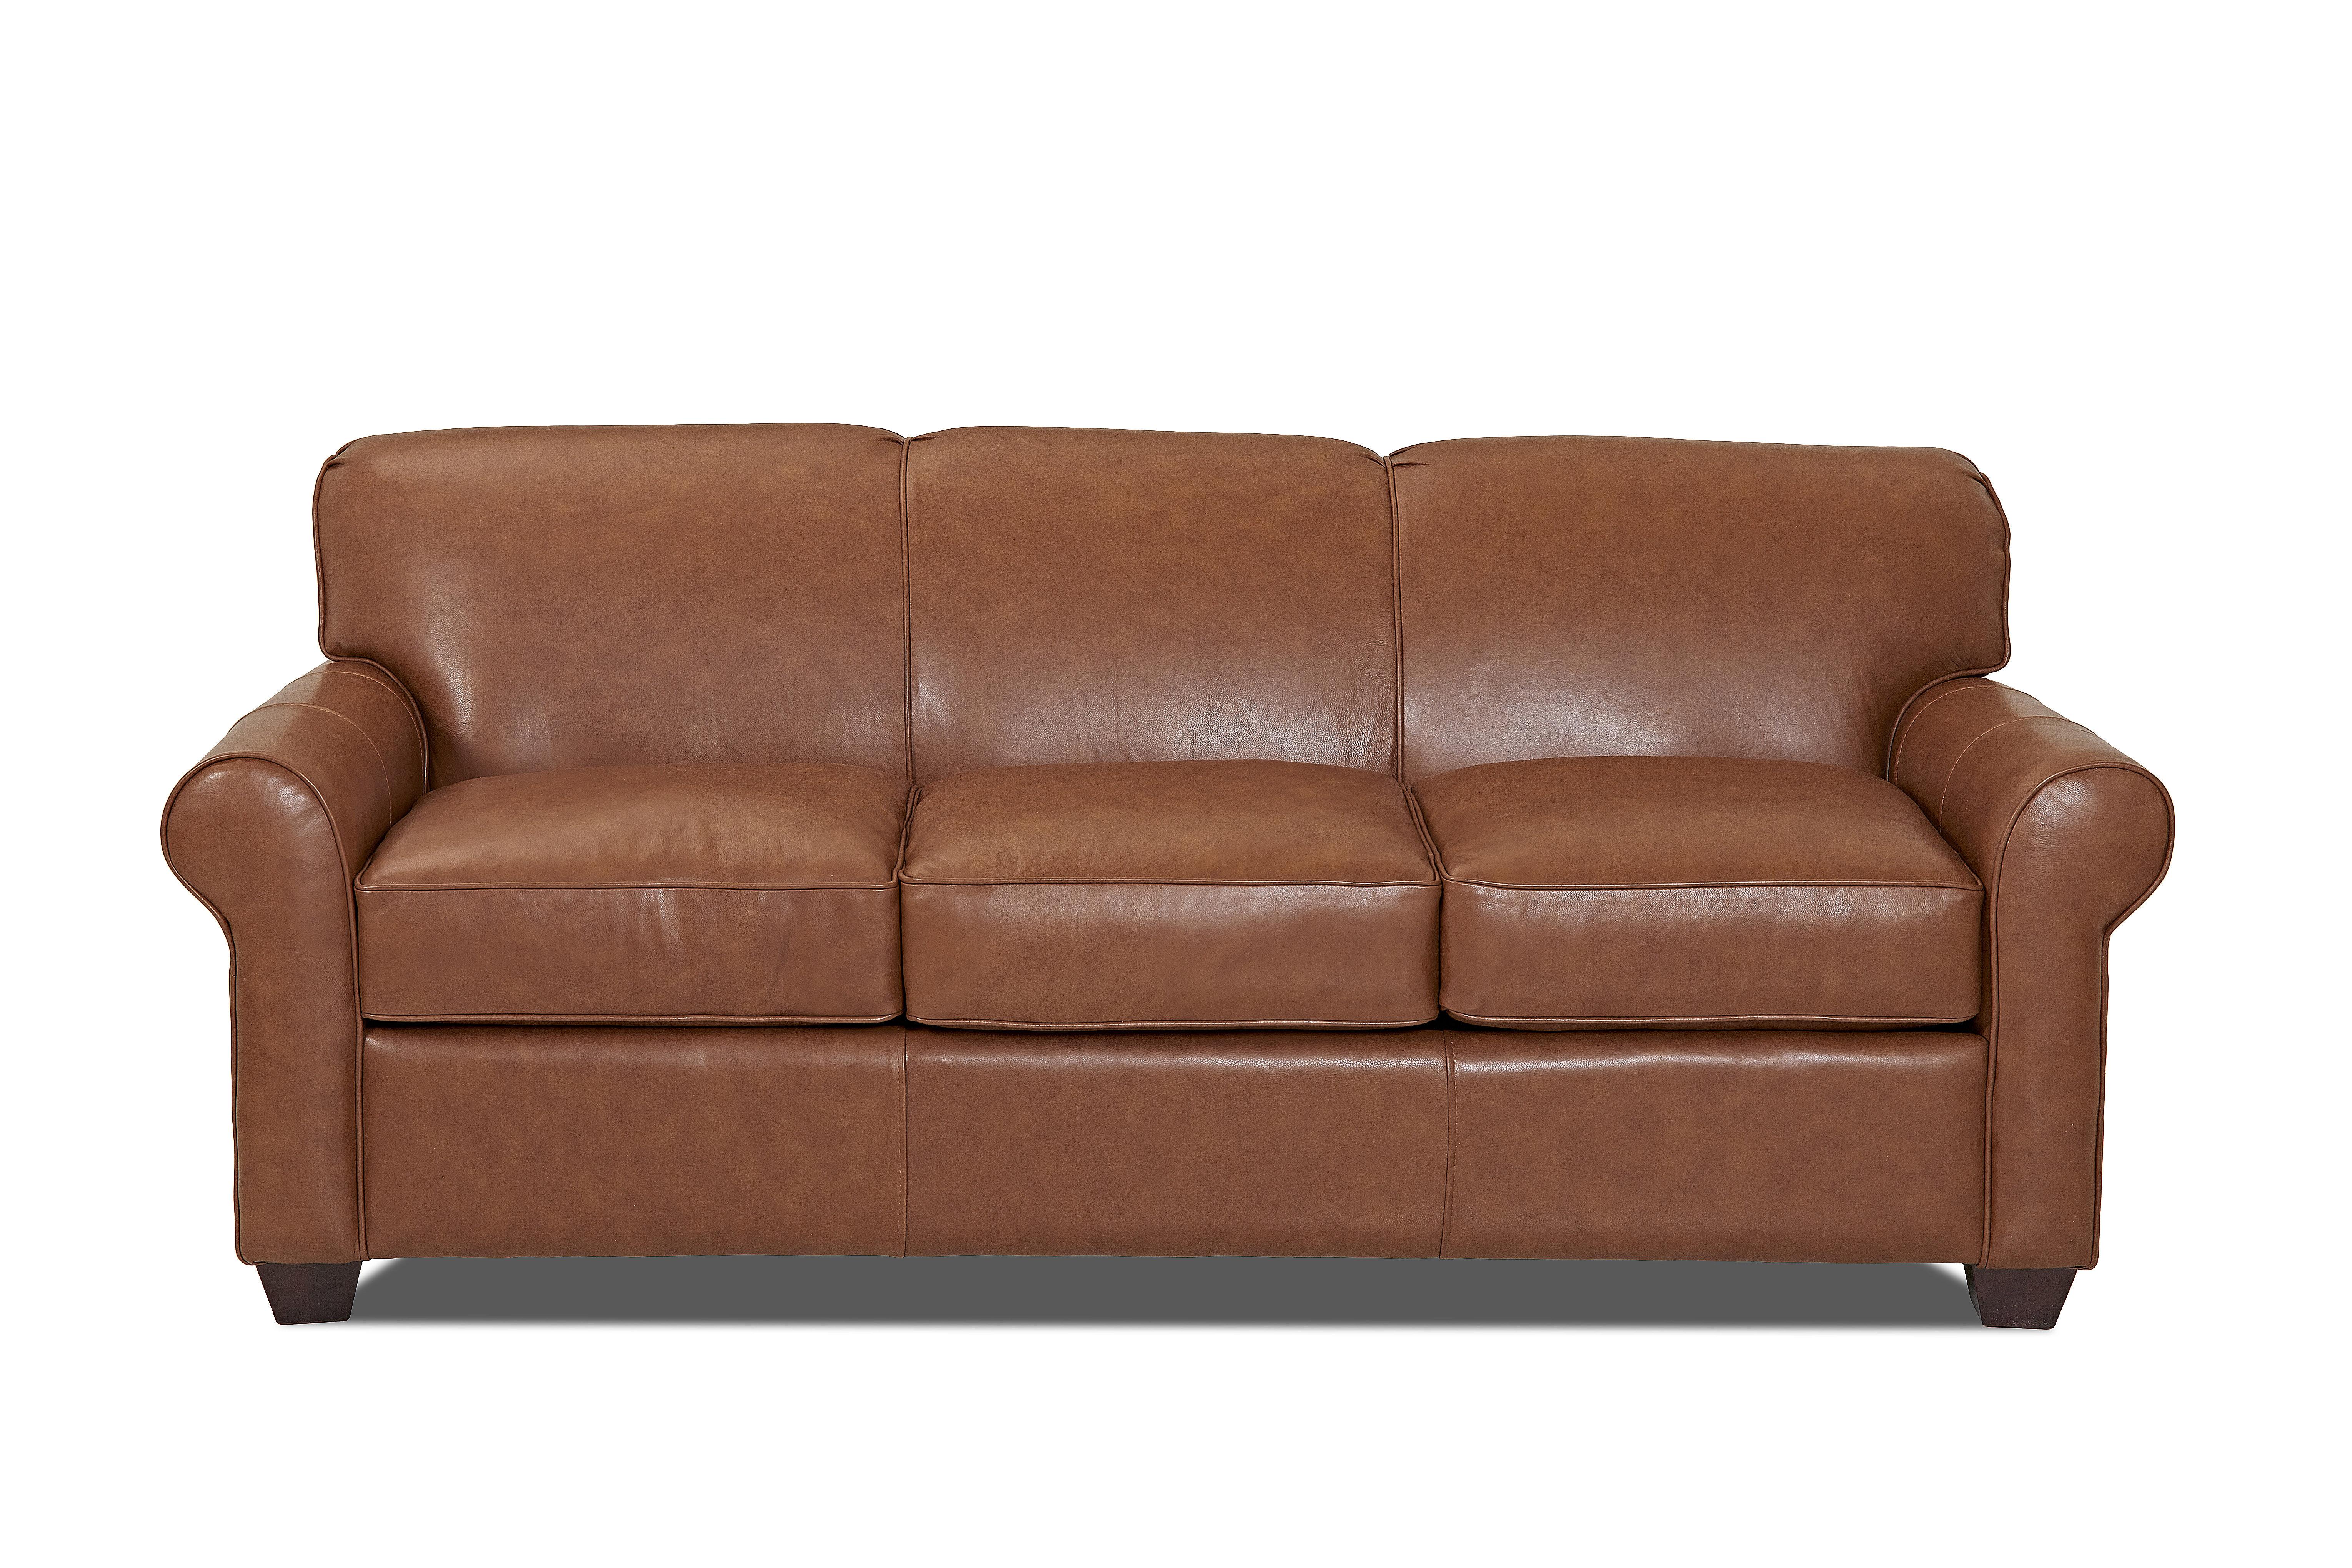 Wayfair Custom Upholstery Jennifer Leather Sofa Bed Reviews